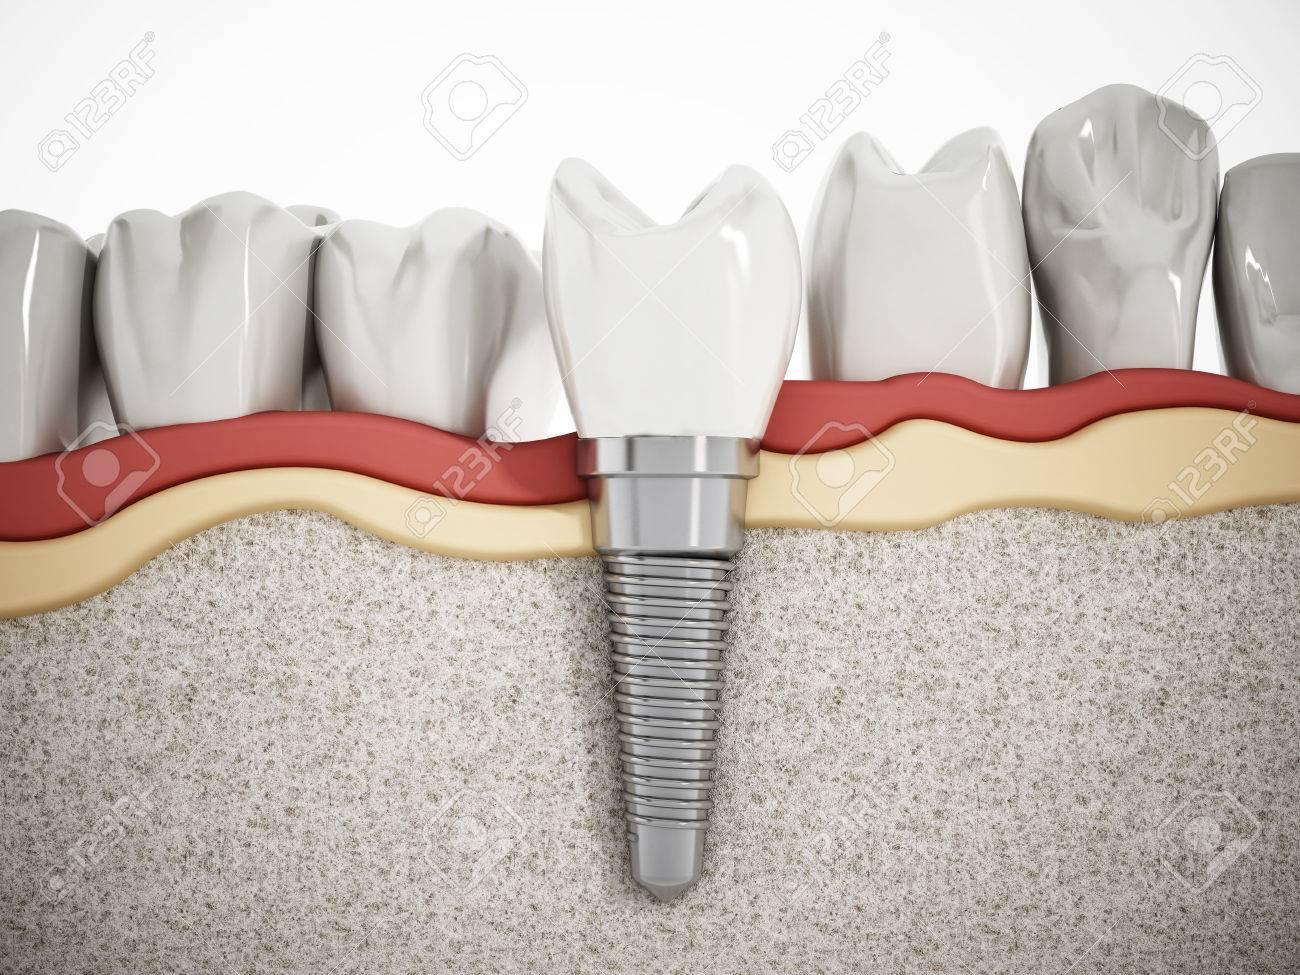 Illustration of teeth showing dental implant structure Stock Illustration - 52571983